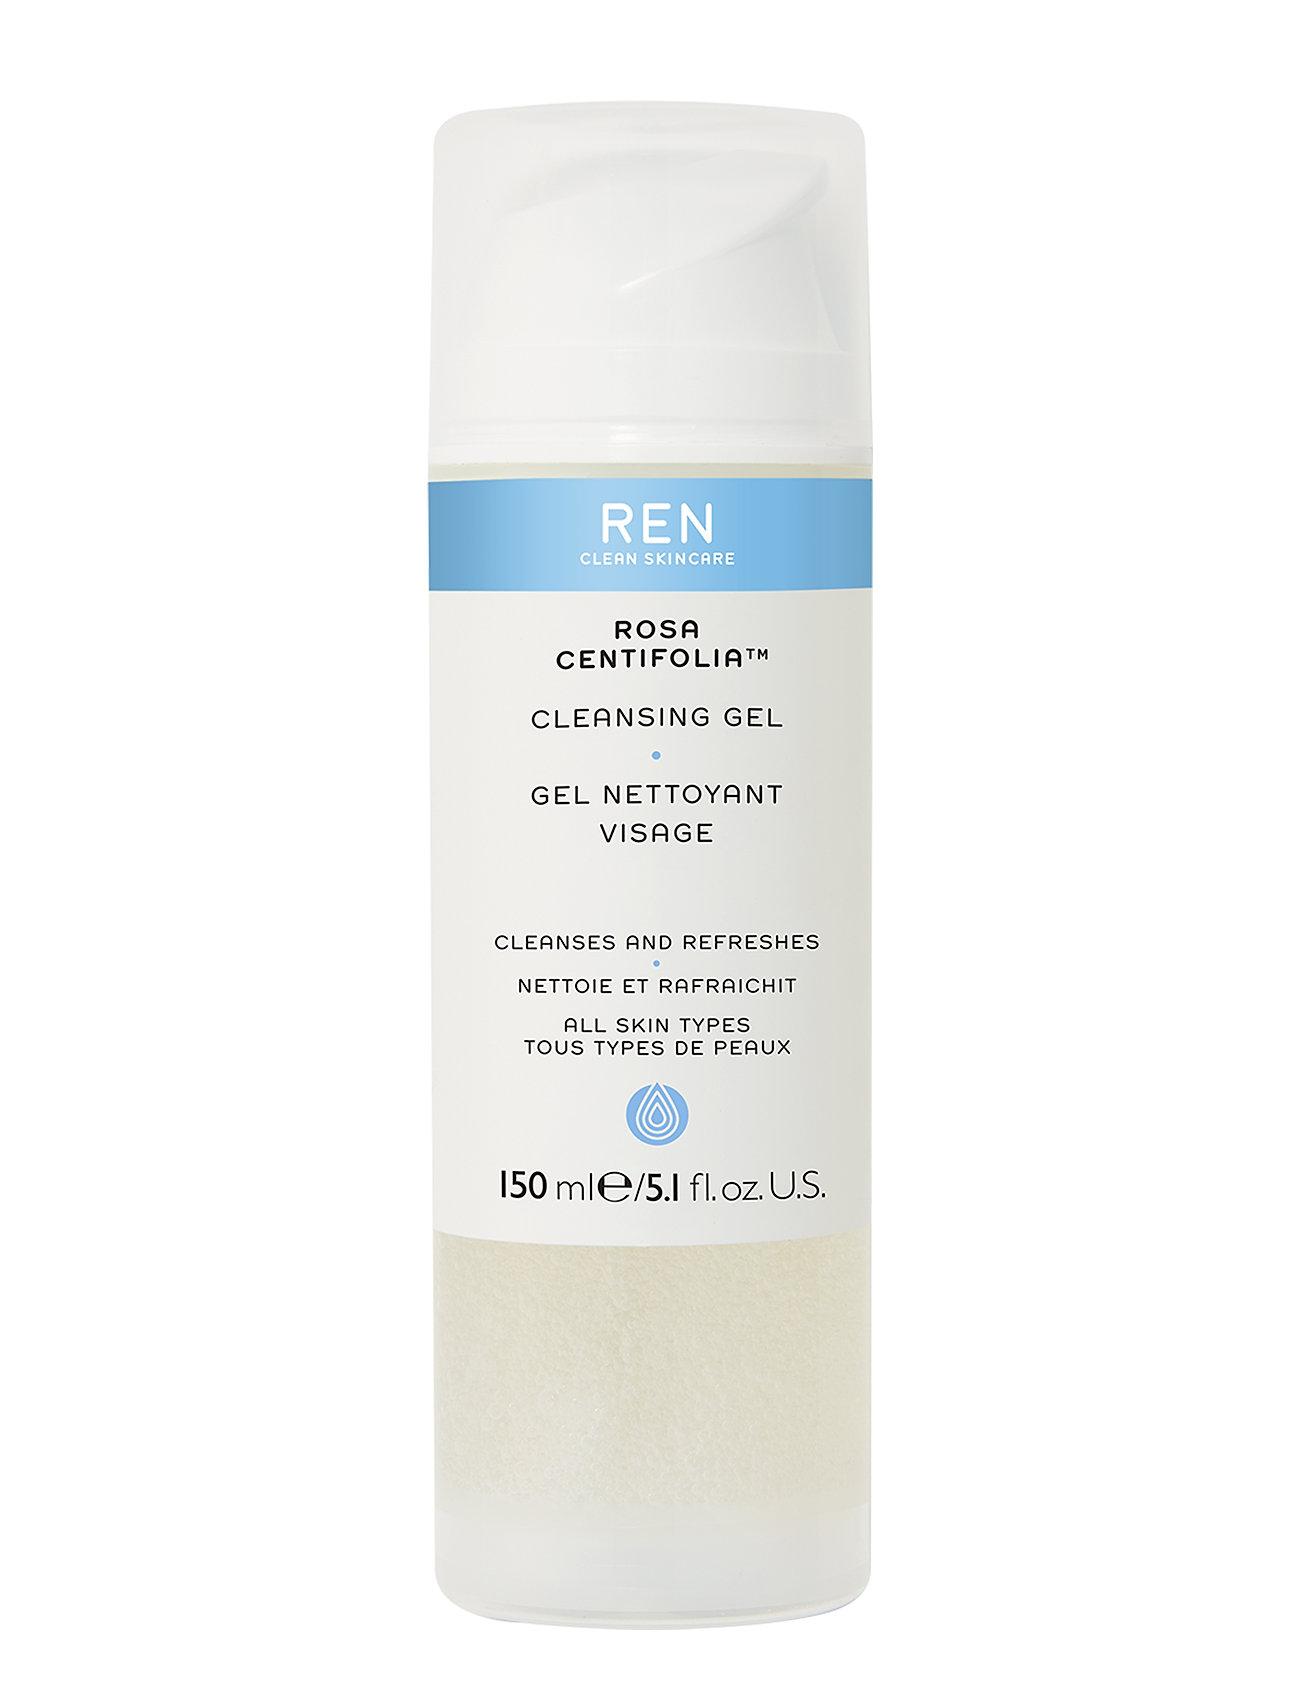 REN ROSA CENTIFOLIA CLEANSING GEL - CLEAR